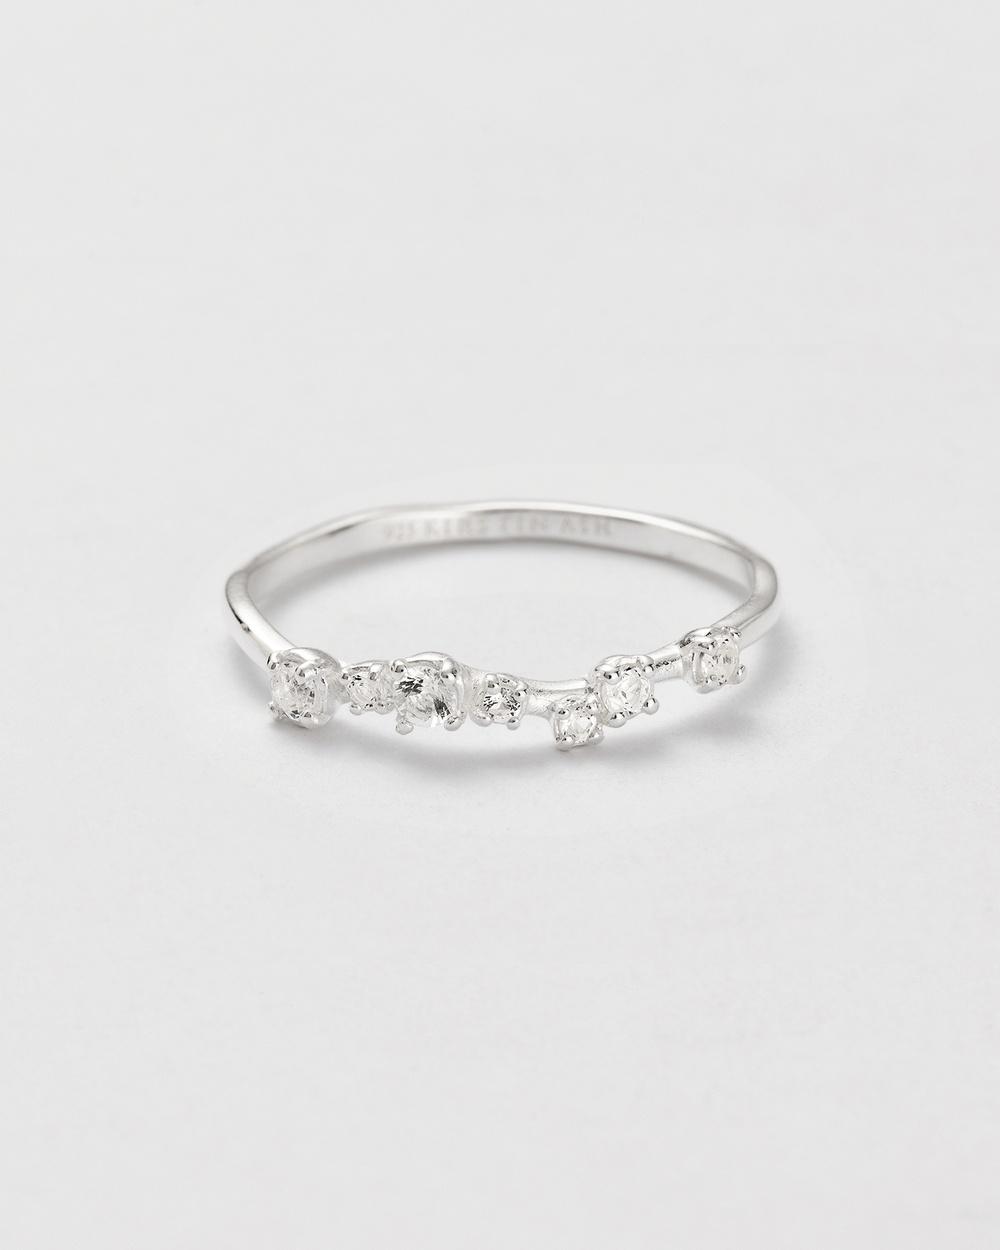 Kirstin Ash Shimmer Topaz Ring Jewellery Silver